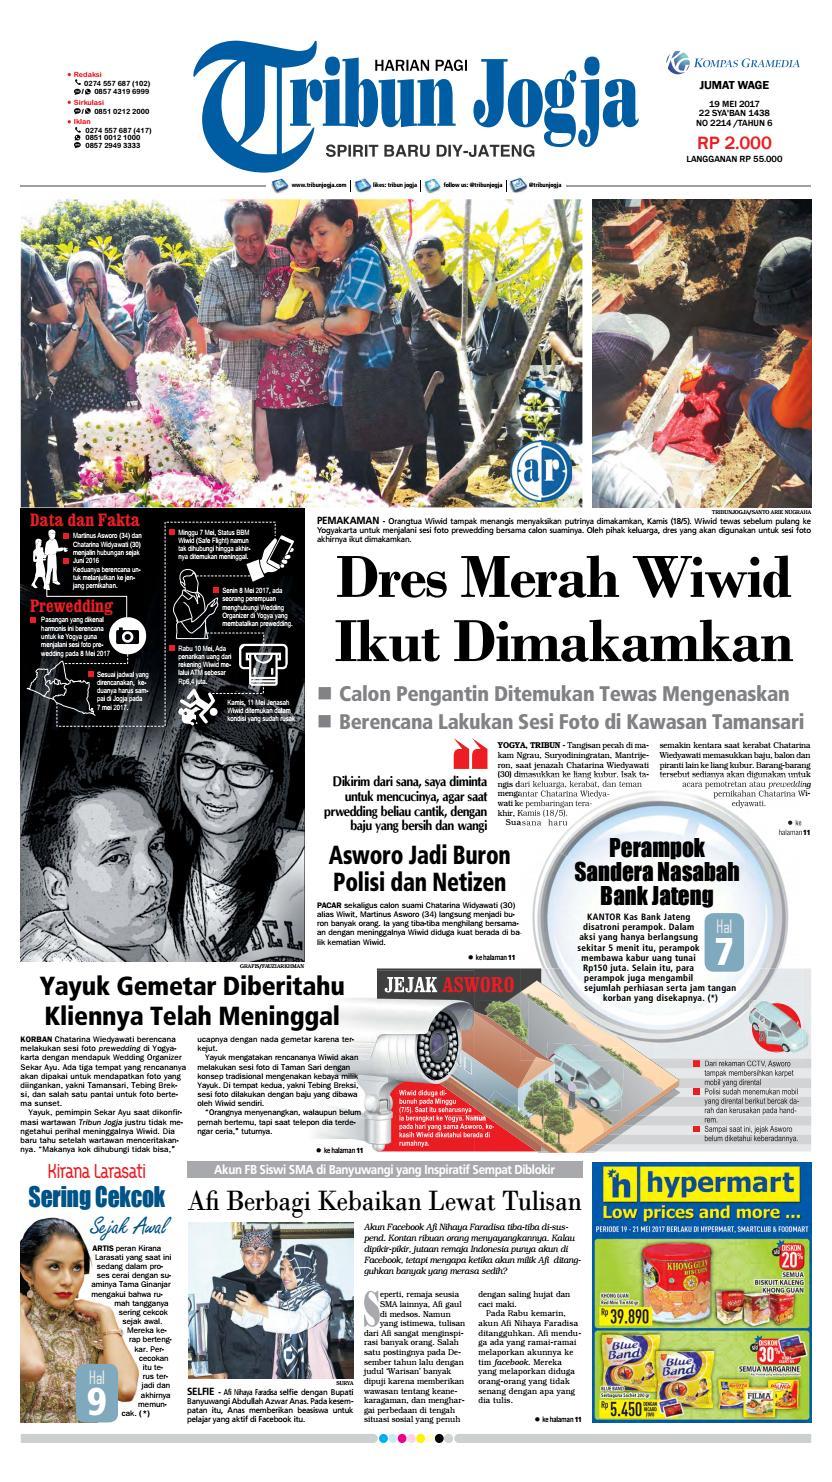 Tribunjogja 19 05 2017 By Tribun Jogja Issuu Produk Ukm Bumn Wisata Mewah Bali 3hr 2mlm